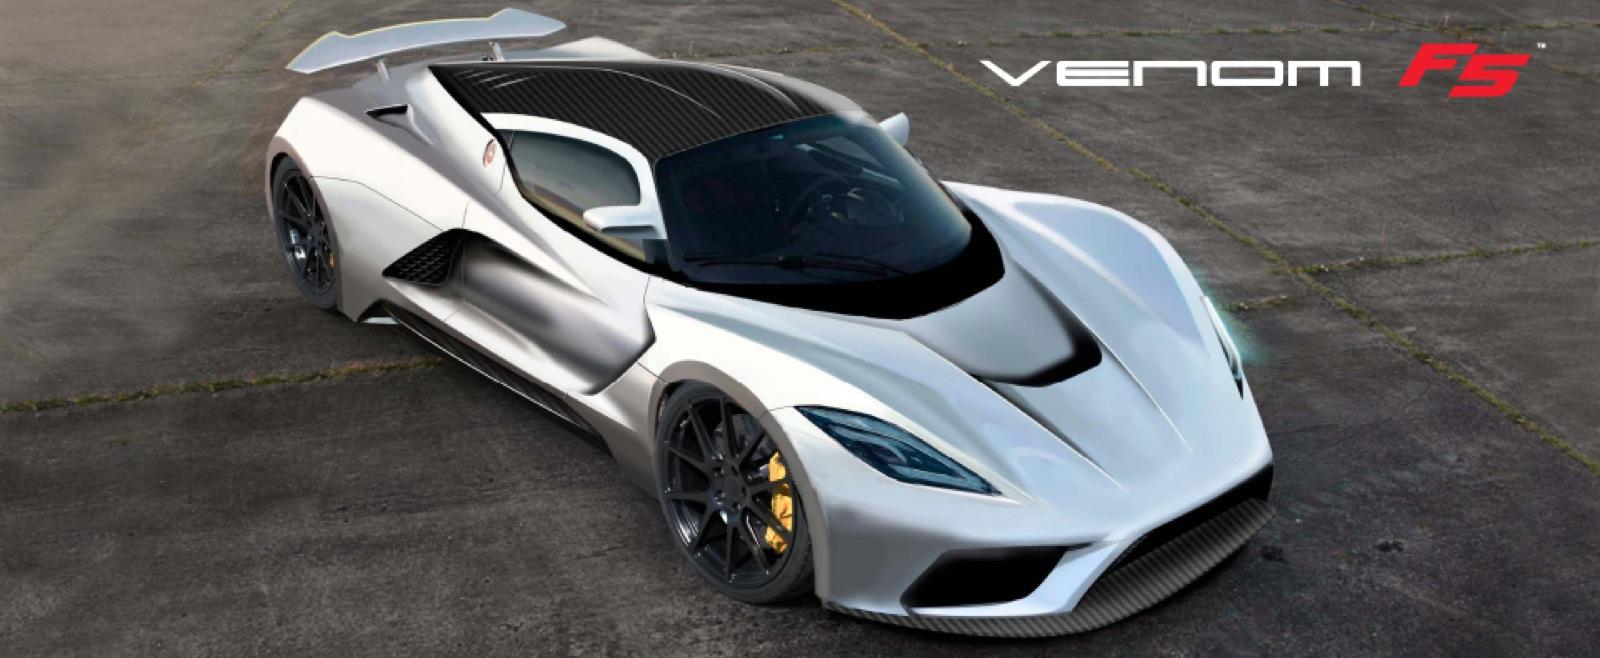 Venom-F4-4.jpg